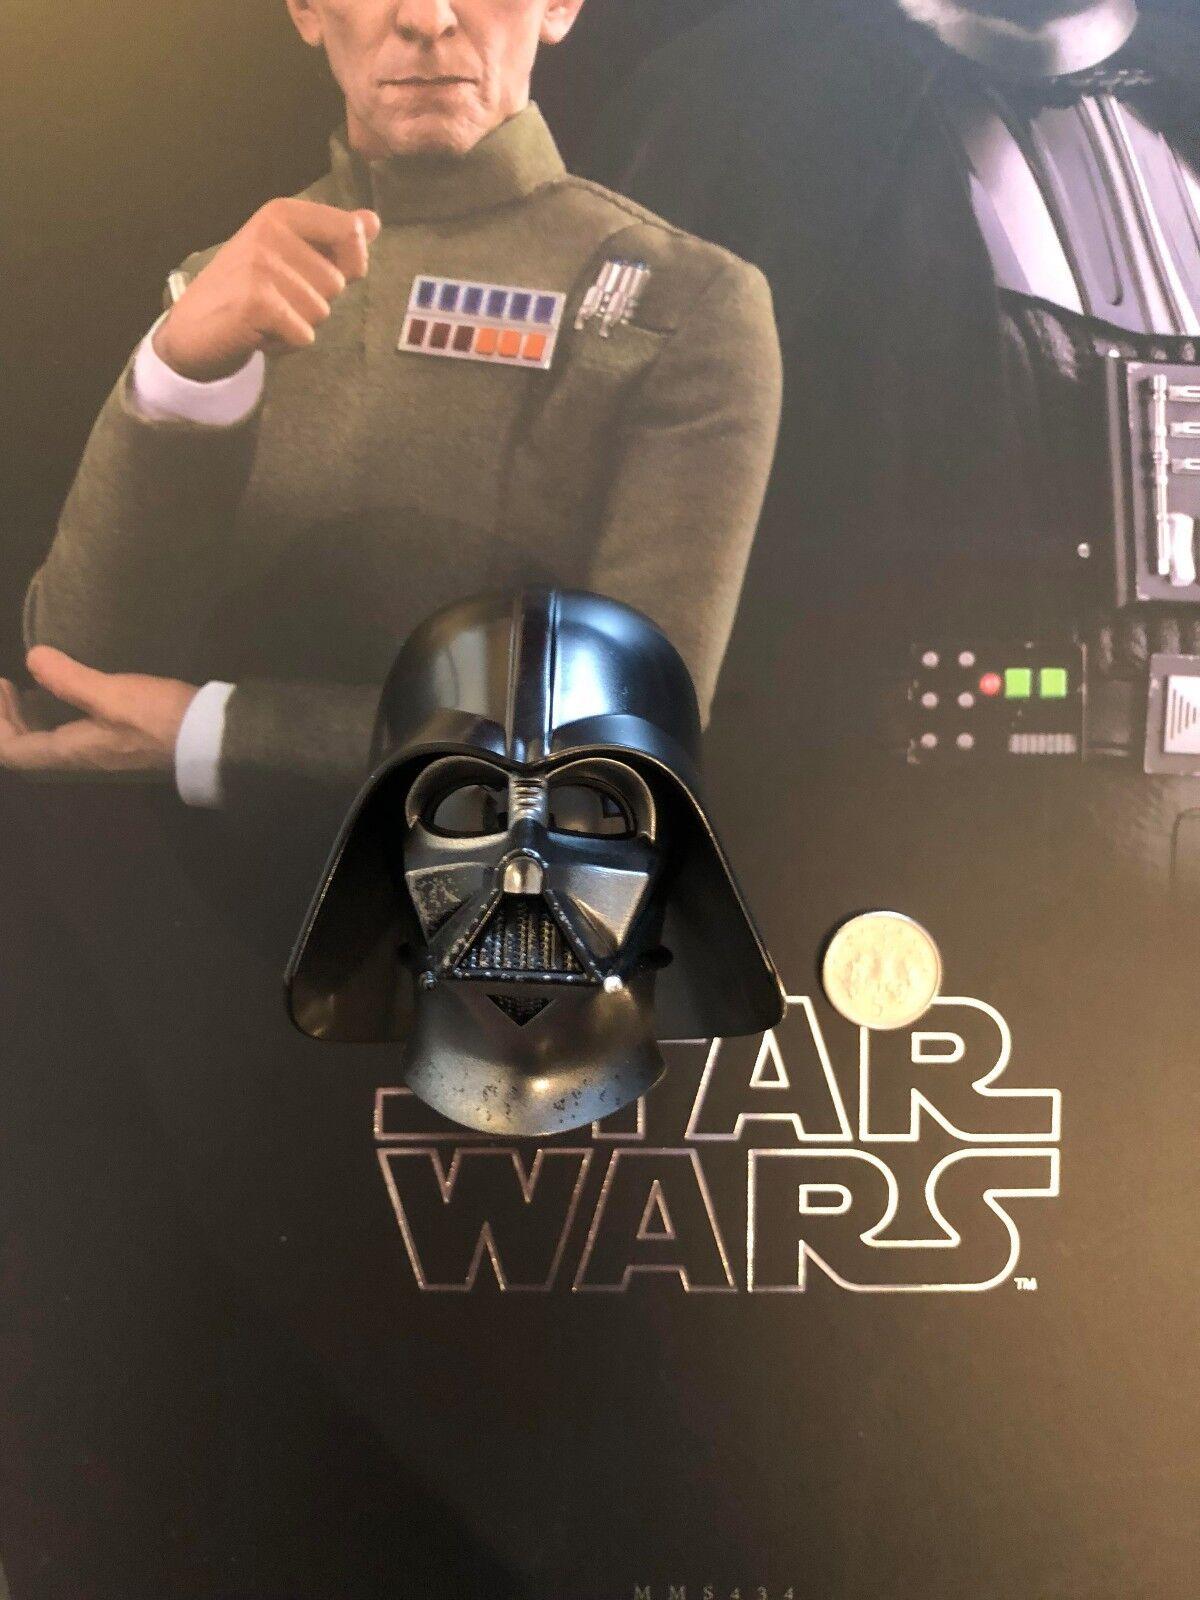 Hot Toys Star Wars Darth Vader Helmet Head Sculpt MMS434 loose 1/6th scale